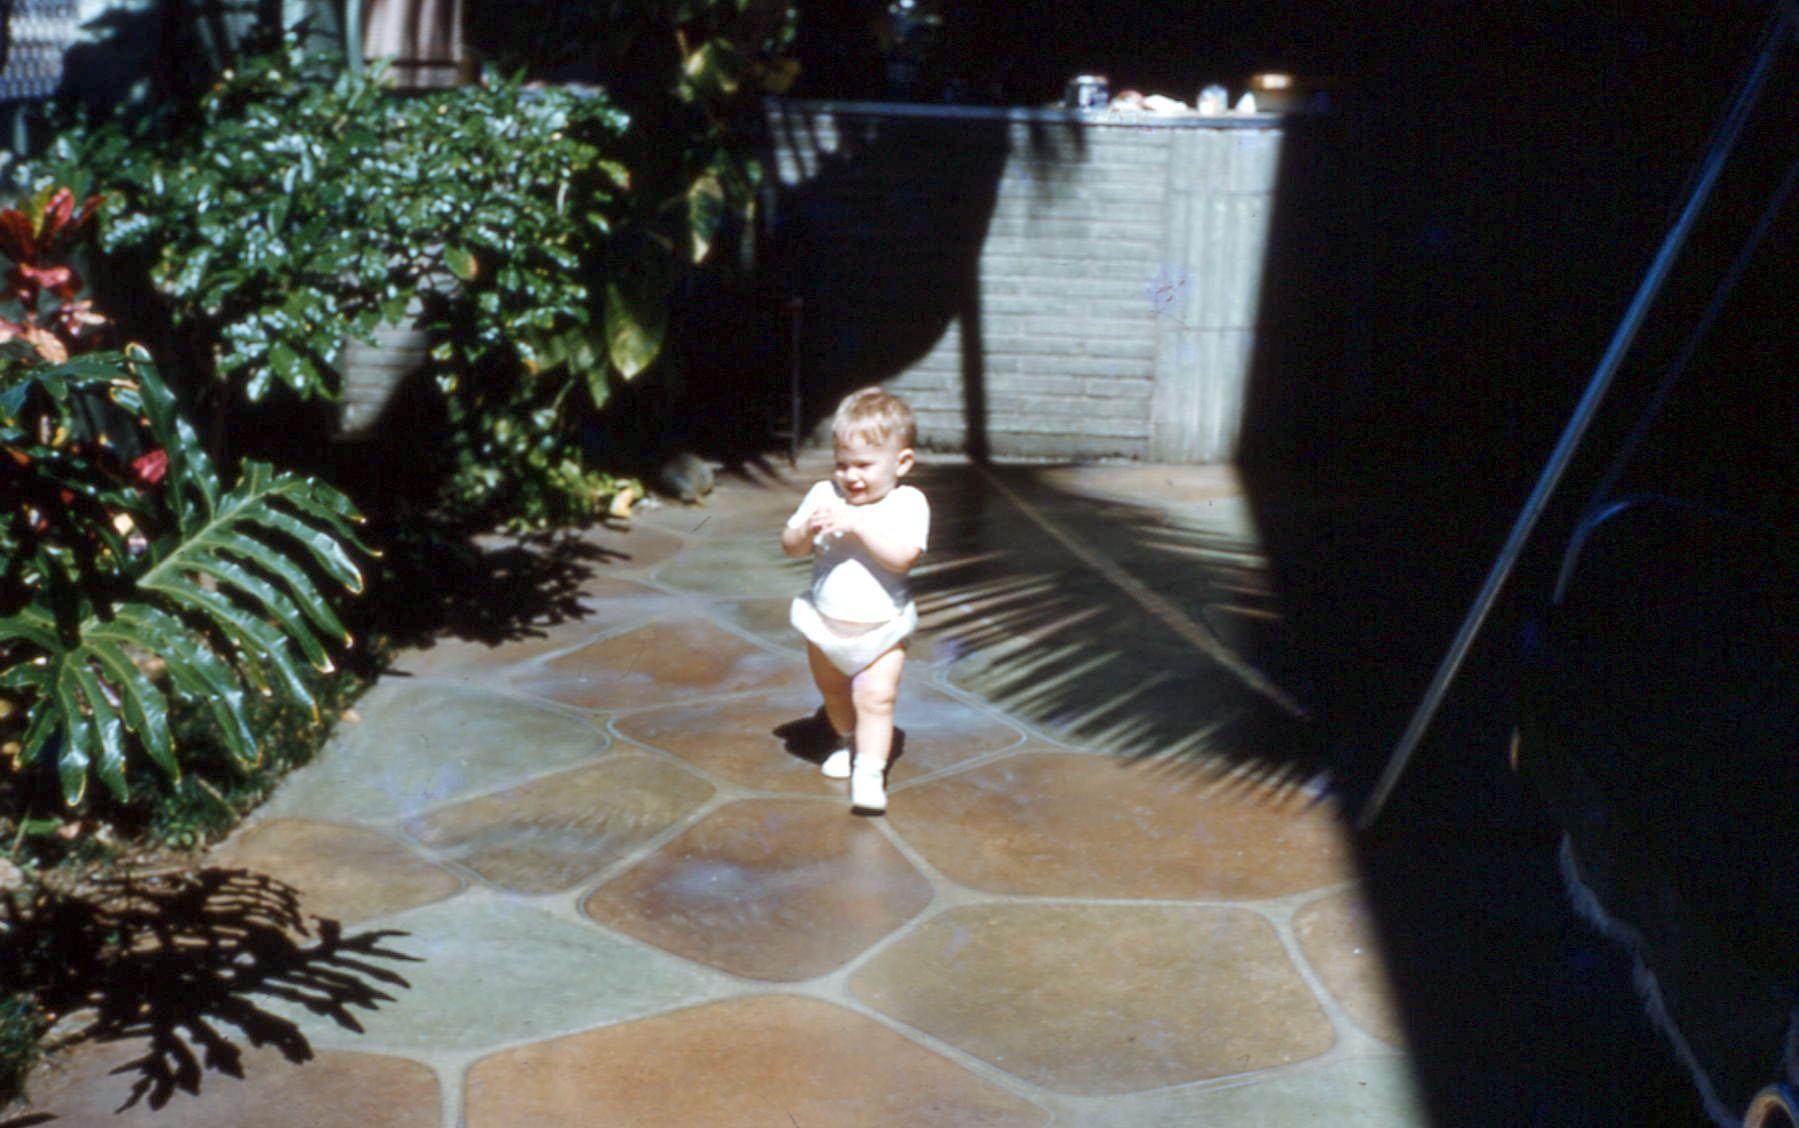 Stone Tiles For Backyard : Description Stone tile patio, Hawaii, 1960JPG